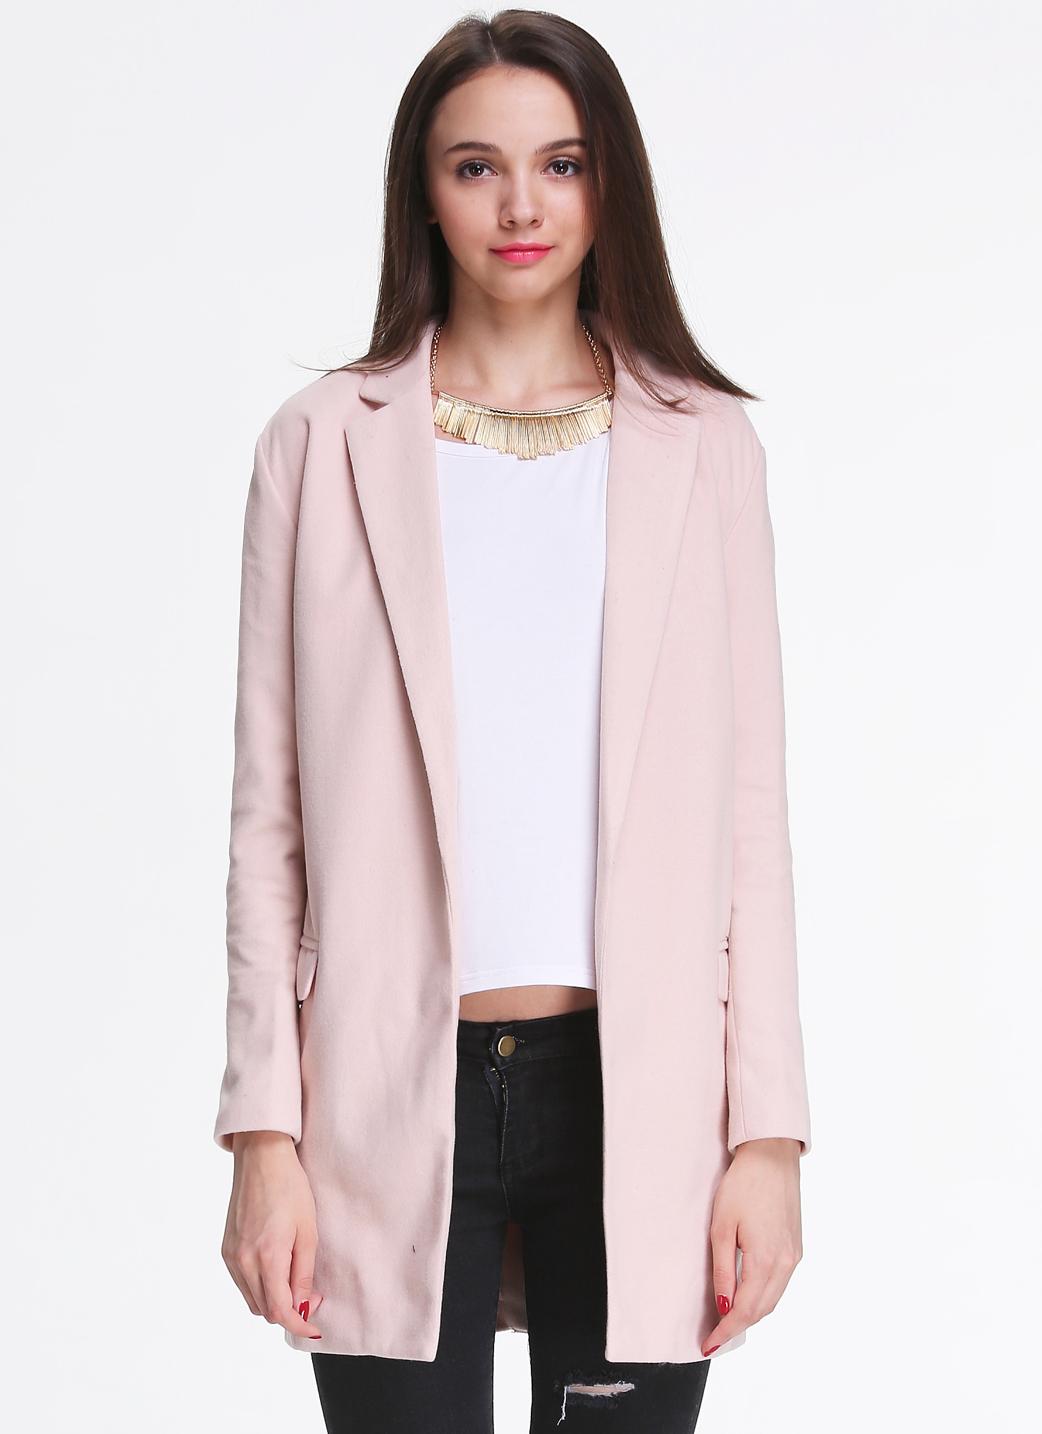 Long Sleeve Notch Lapel Coat - Sheinside.com